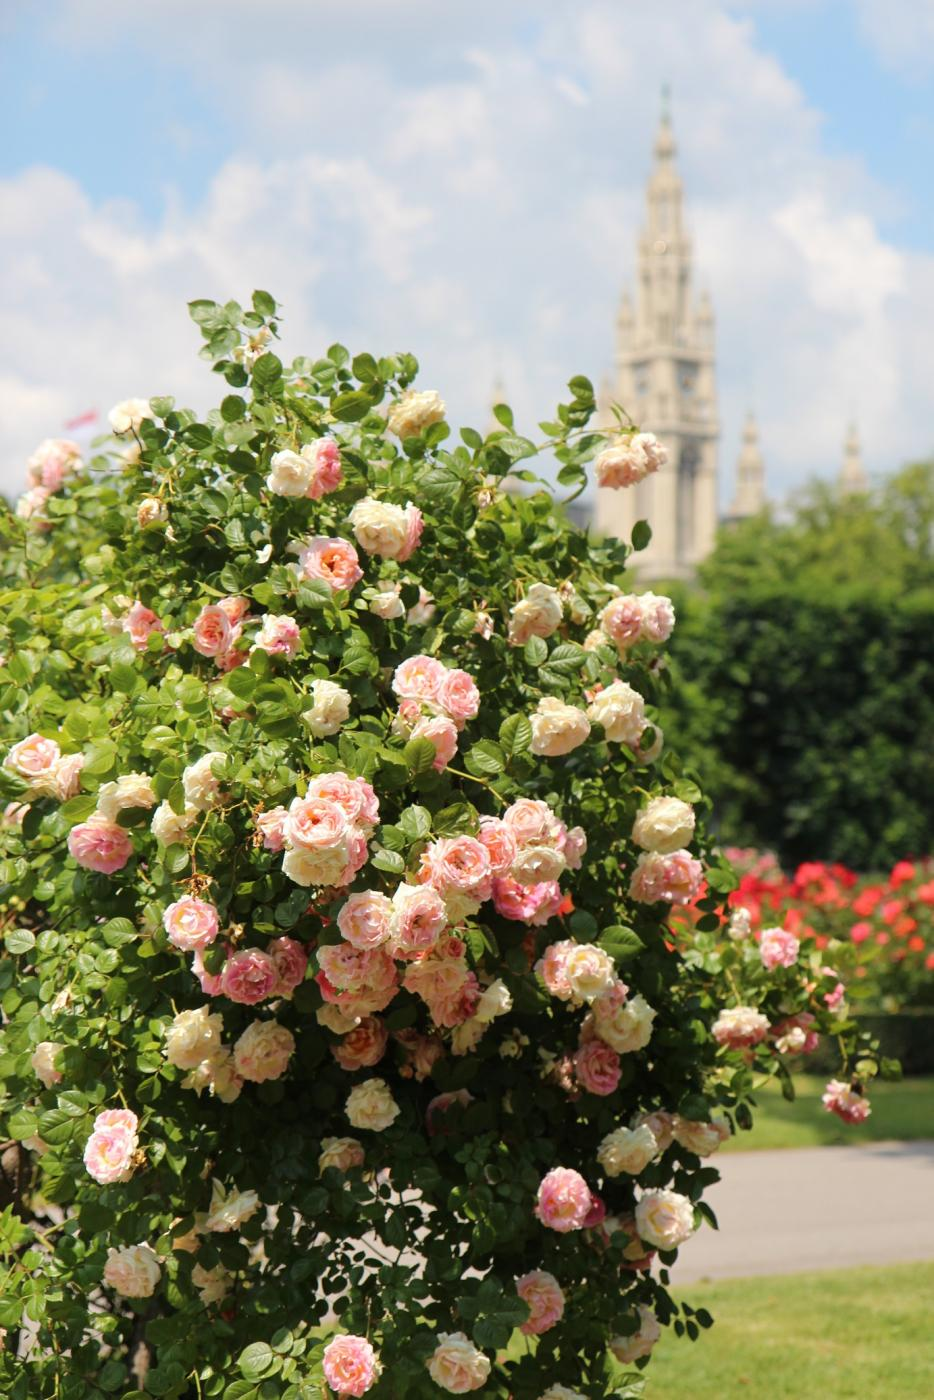 Miljoona ruusua